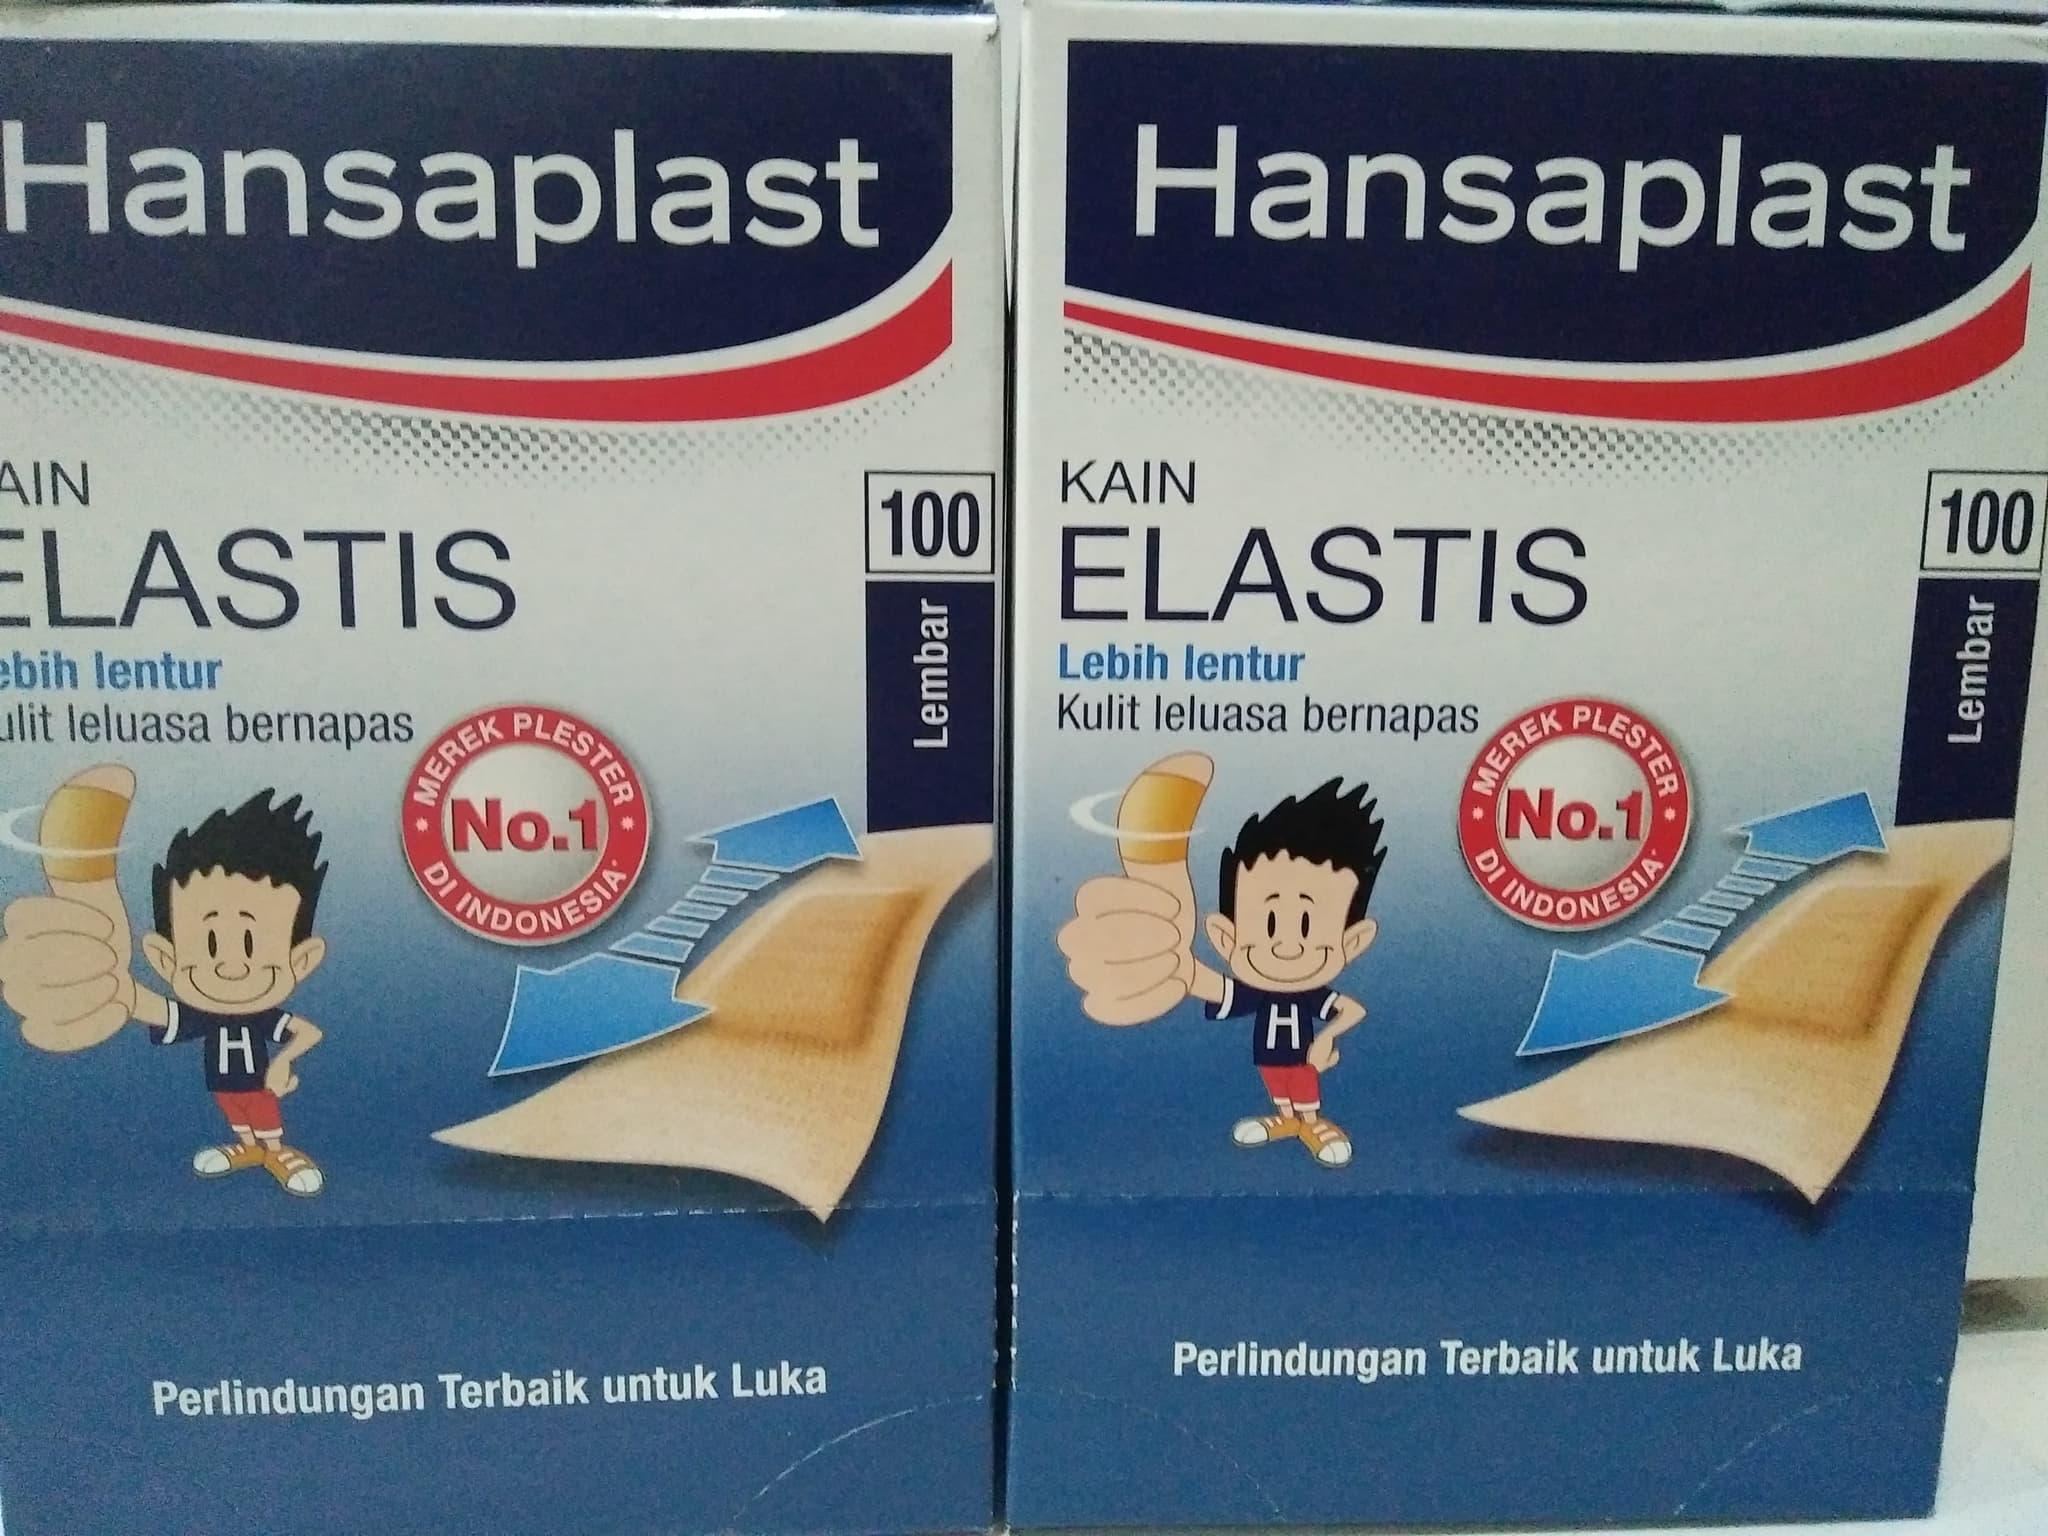 Jual Hansaplast Elastis Box Isi 100 Farma Online Tokopedia